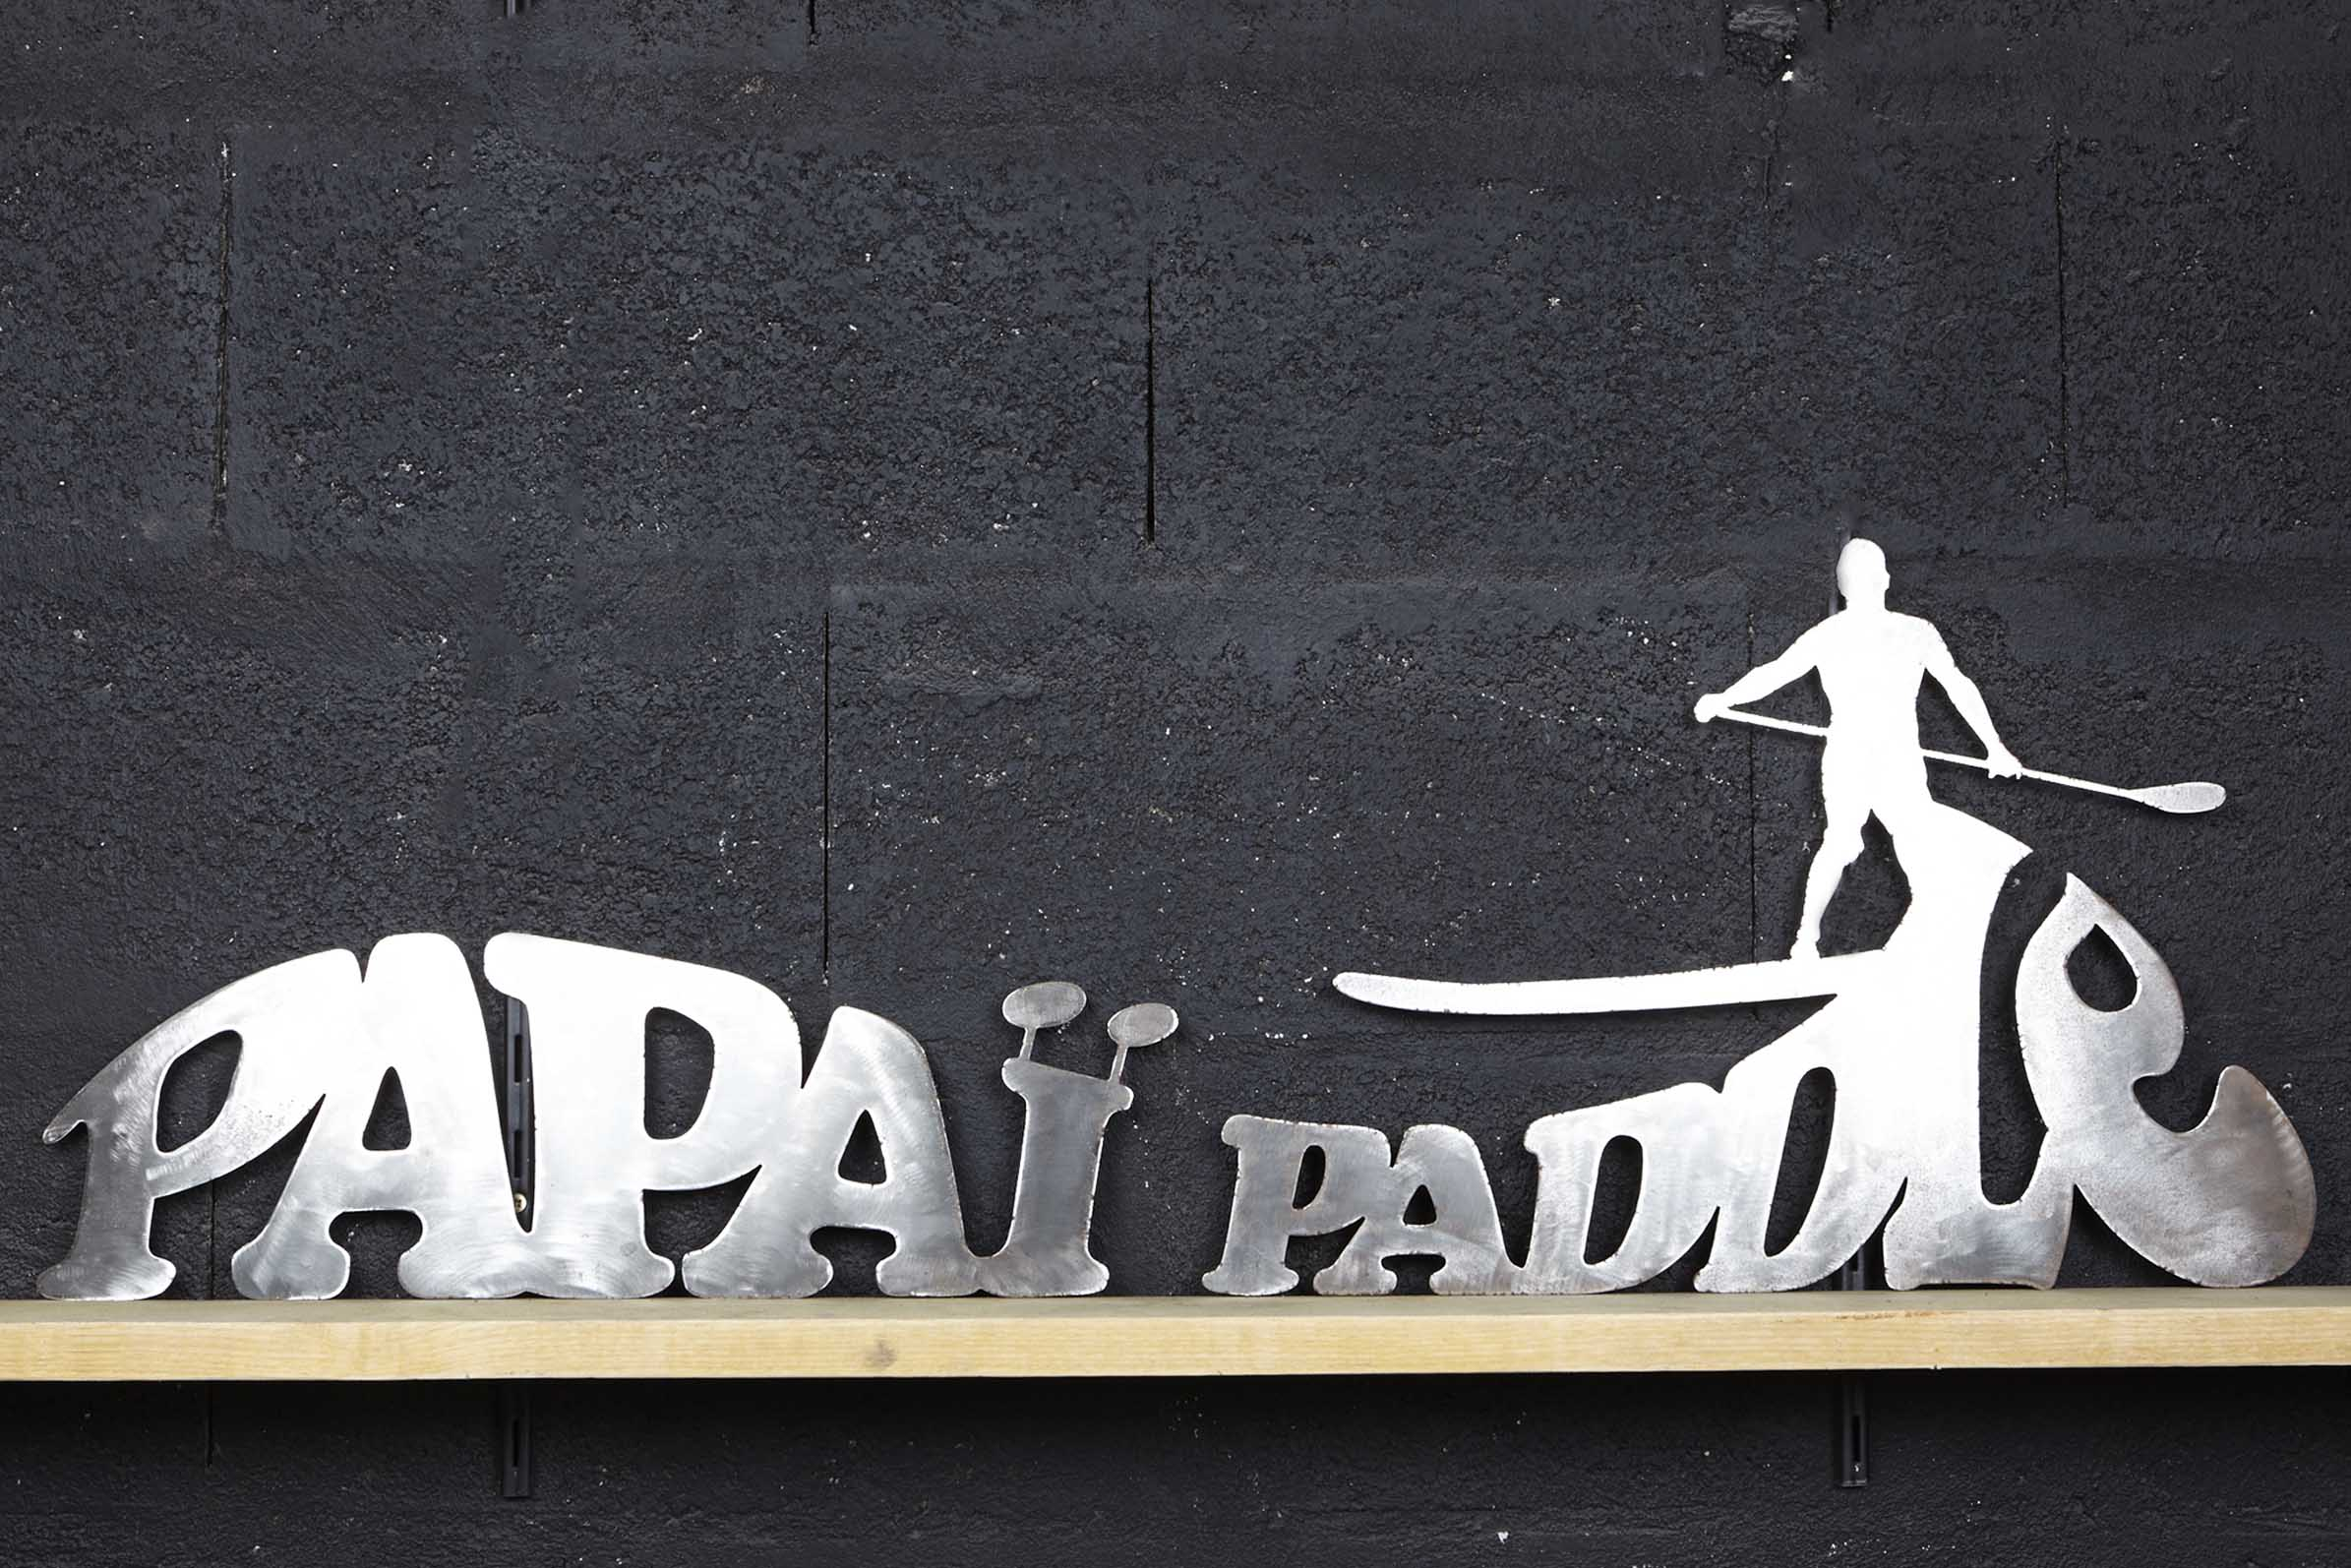 Enseigne Papaï Paddle